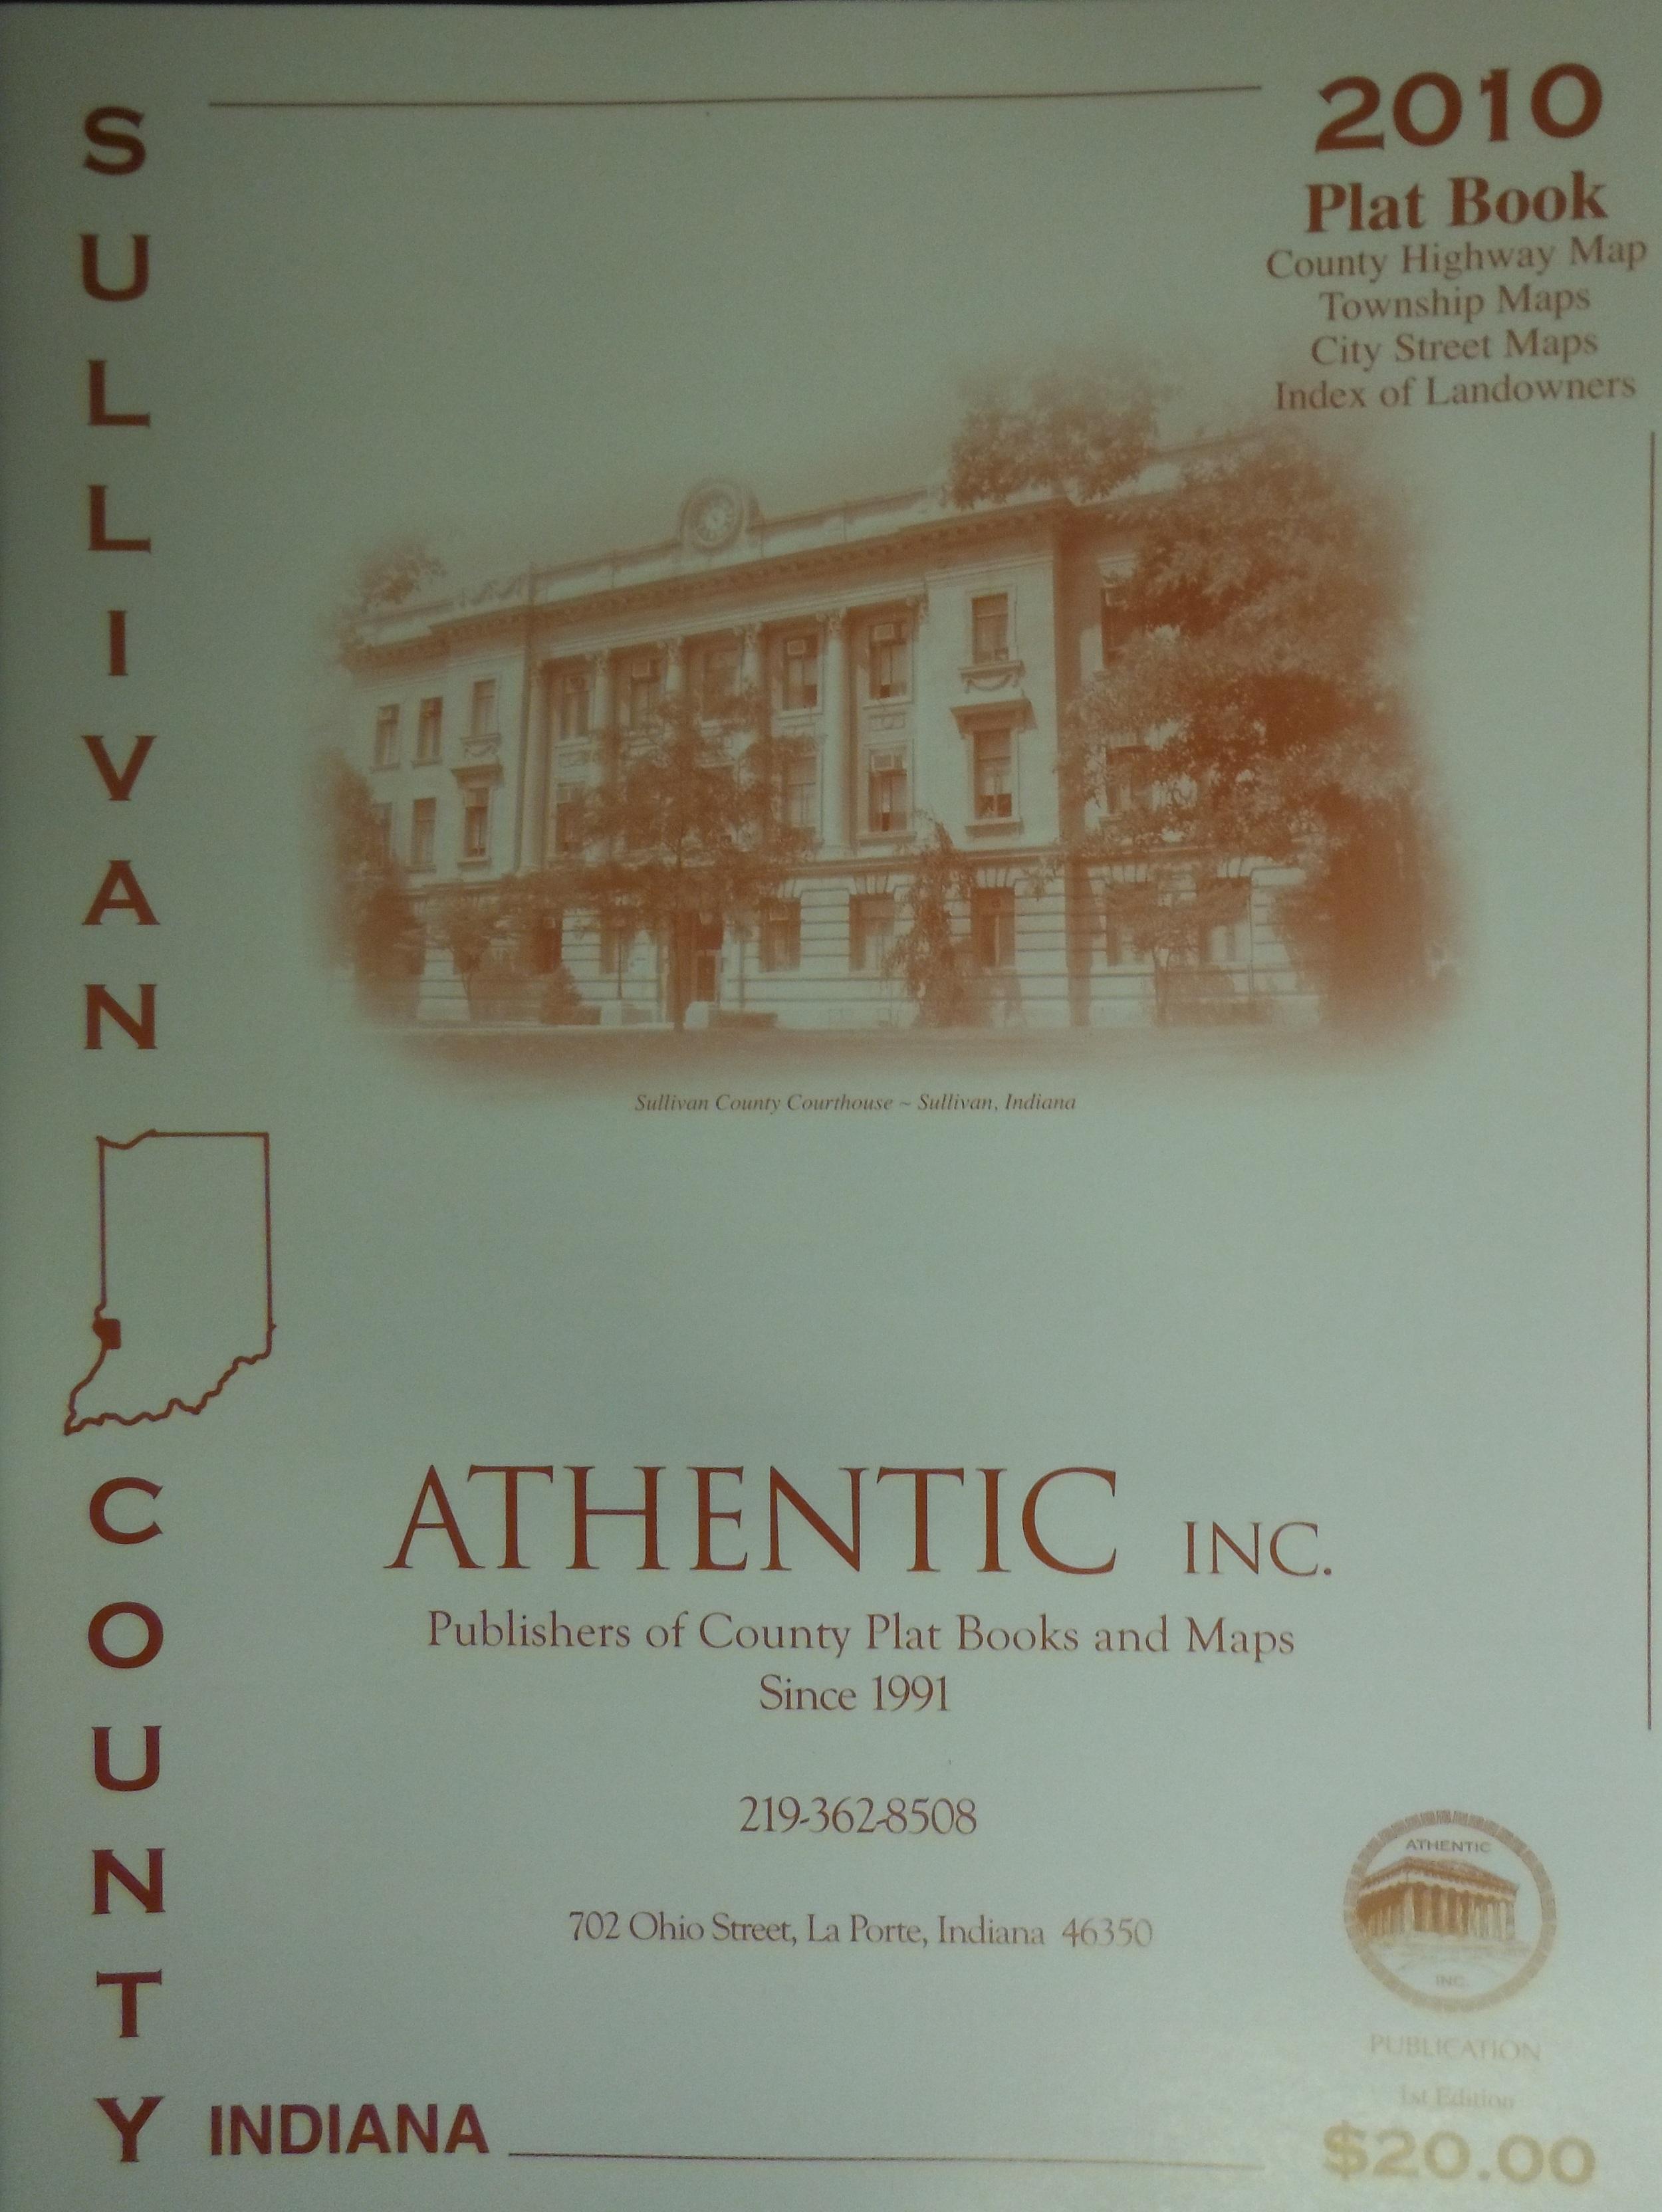 Sullivan County Plat Book $20.00